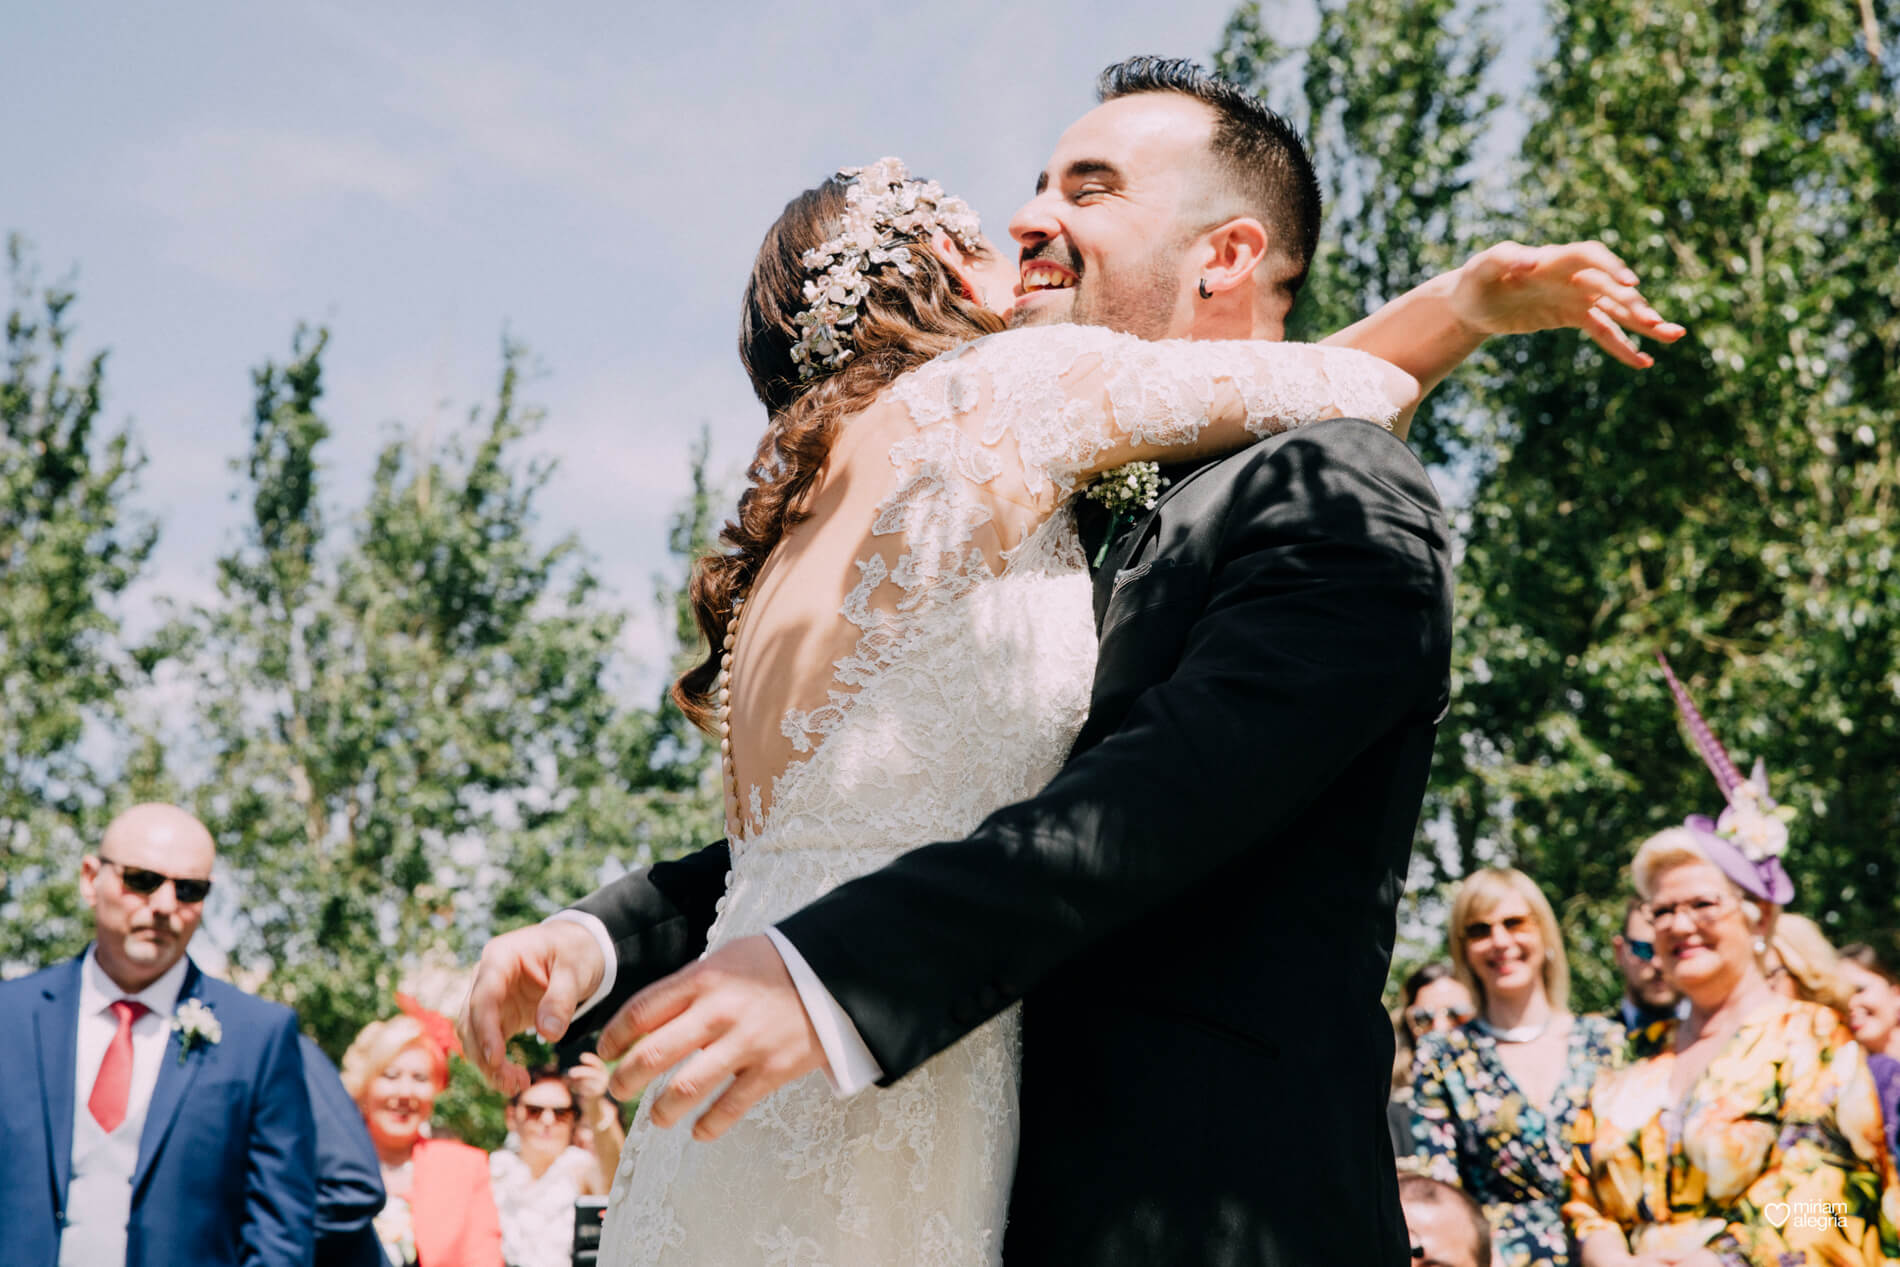 boda-en-finca-jurosa-miriam-alegria-66